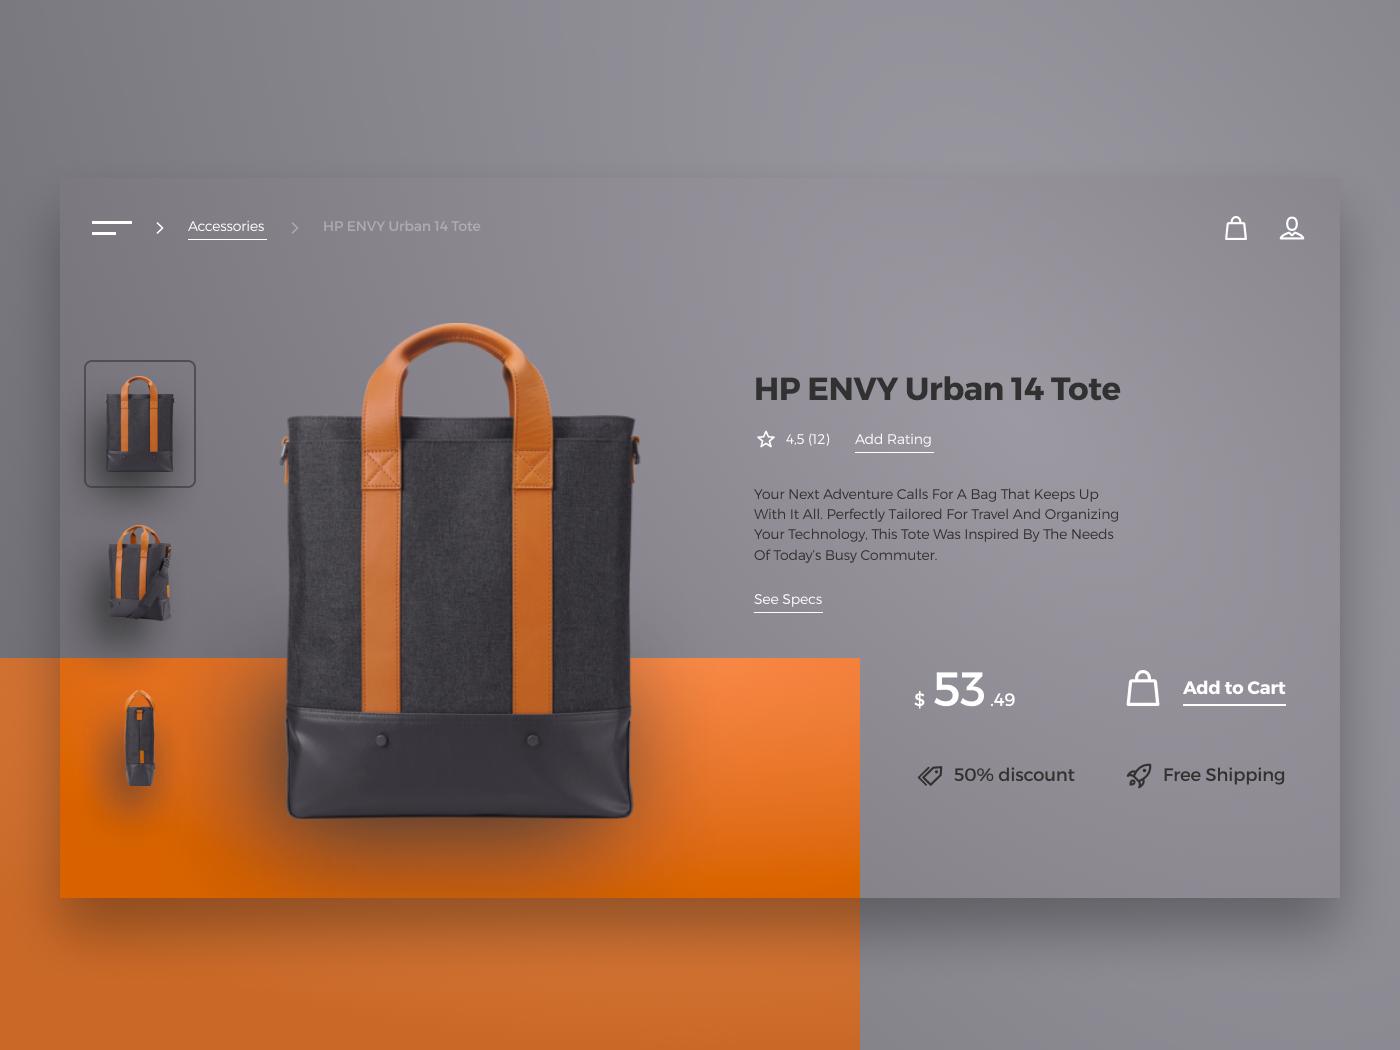 HP ENVY Urban 14 Tote Page Concept By Andrey Semyonov On